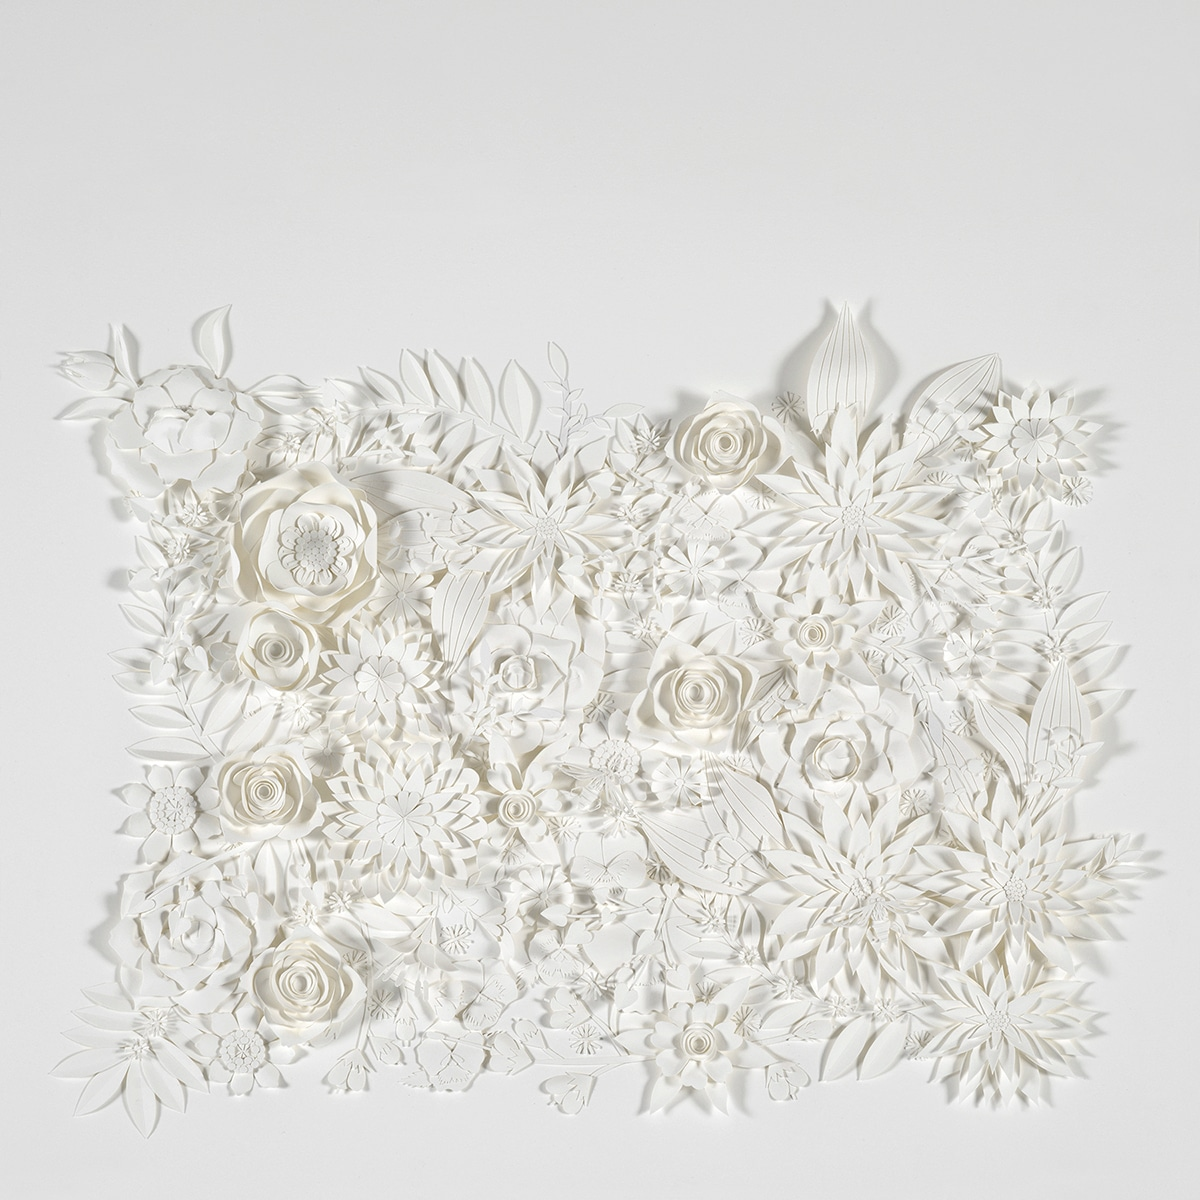 flores de papel por Tara Lee Bennett